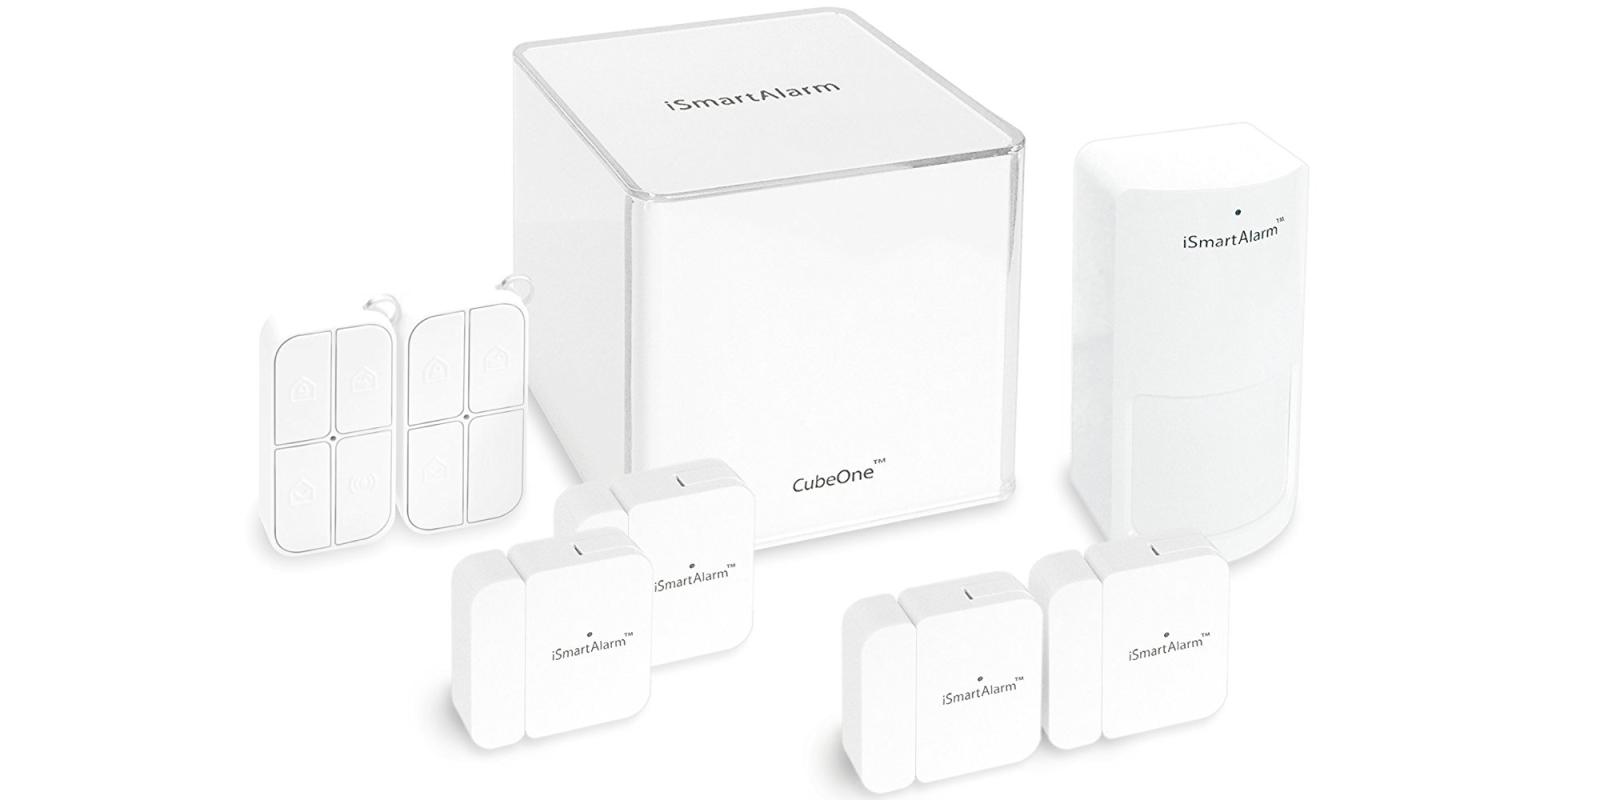 iSmartAlarm's Eight-Piece Security System down to Amazon